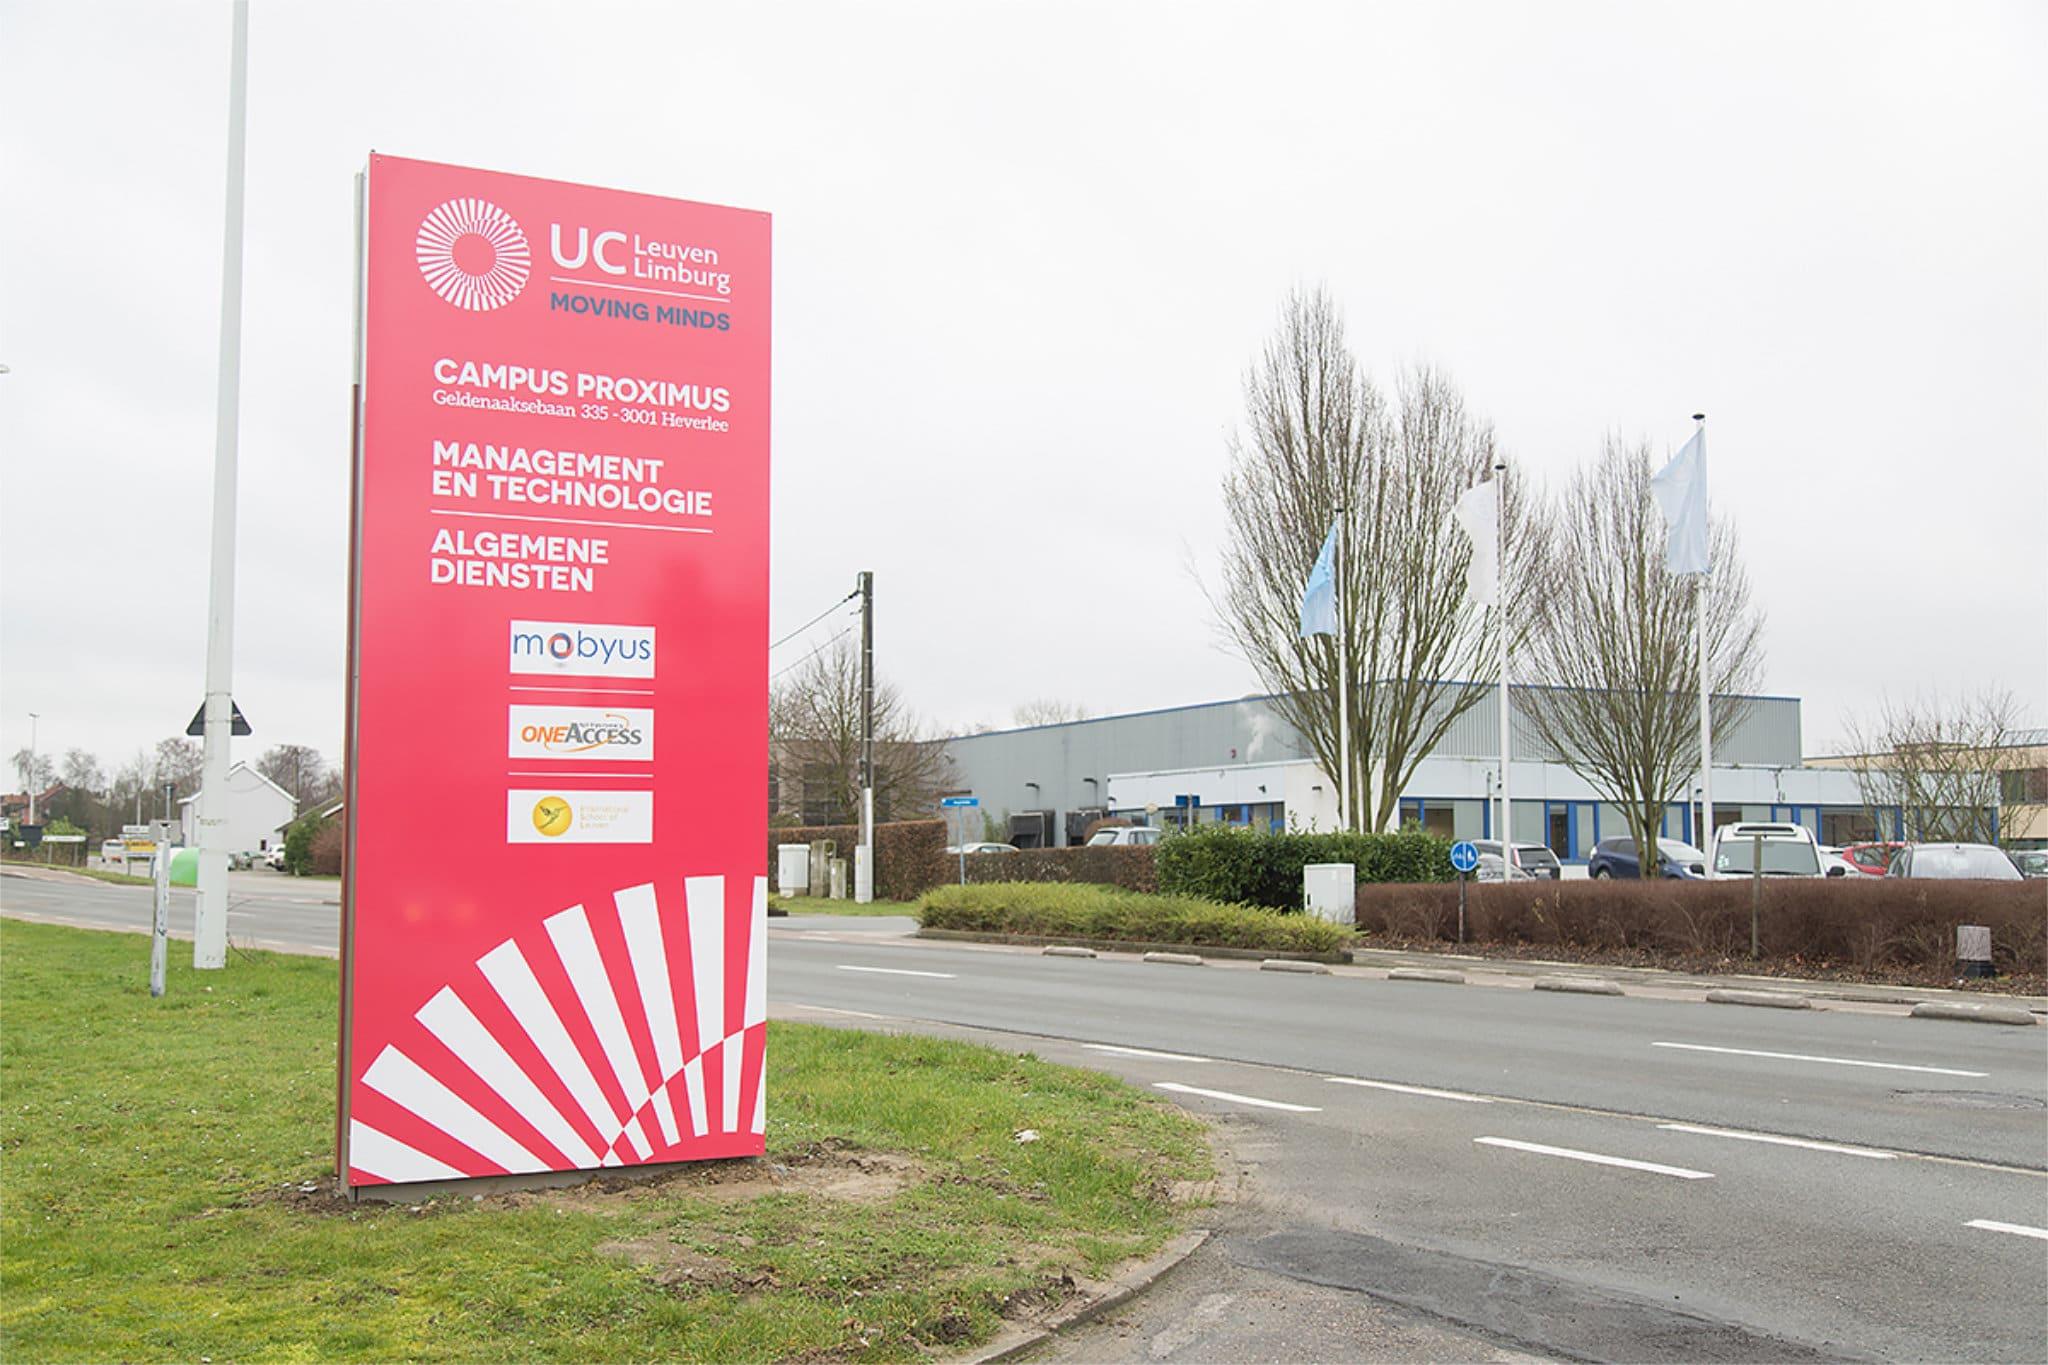 UCLL Campus Proximus Heverlee